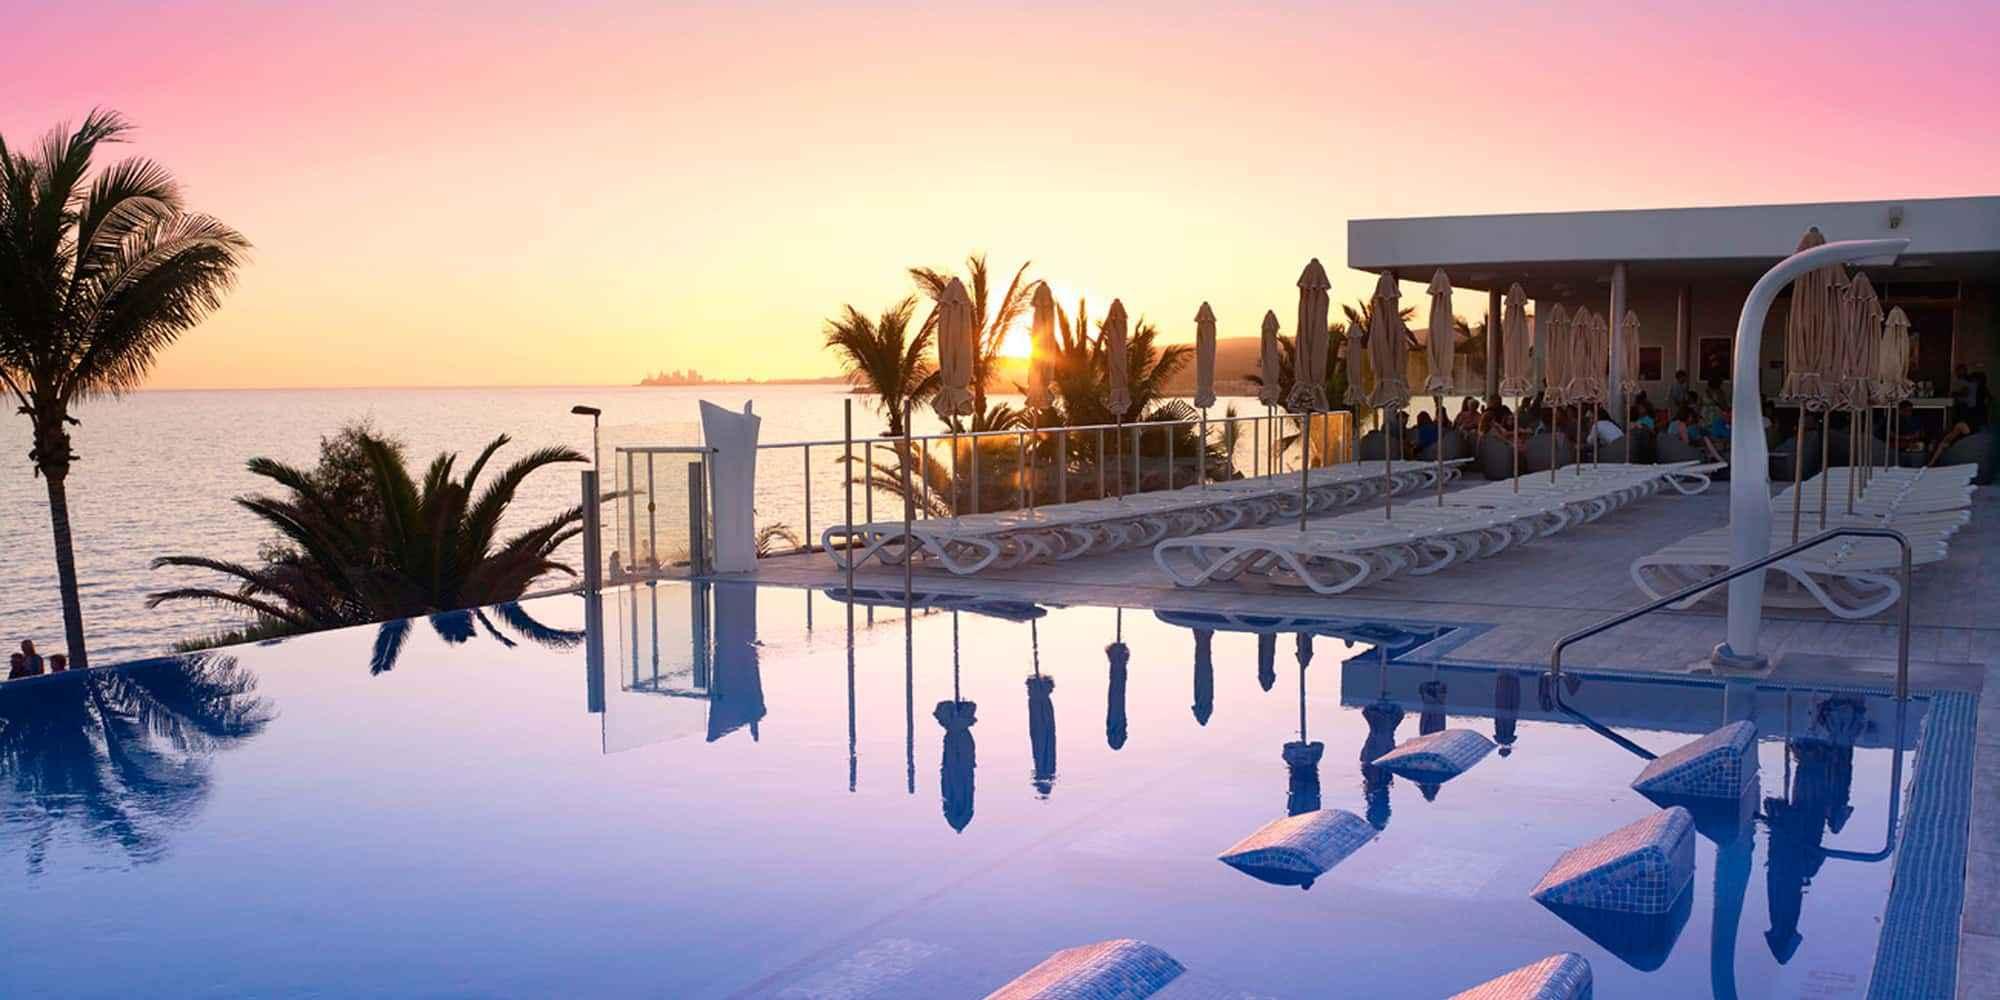 Hotel riu palace tres islas wellnesshotel strand van corralejo - Hotel Riu Palace Tres Islas Wellnesshotel Strand Van Corralejo 35